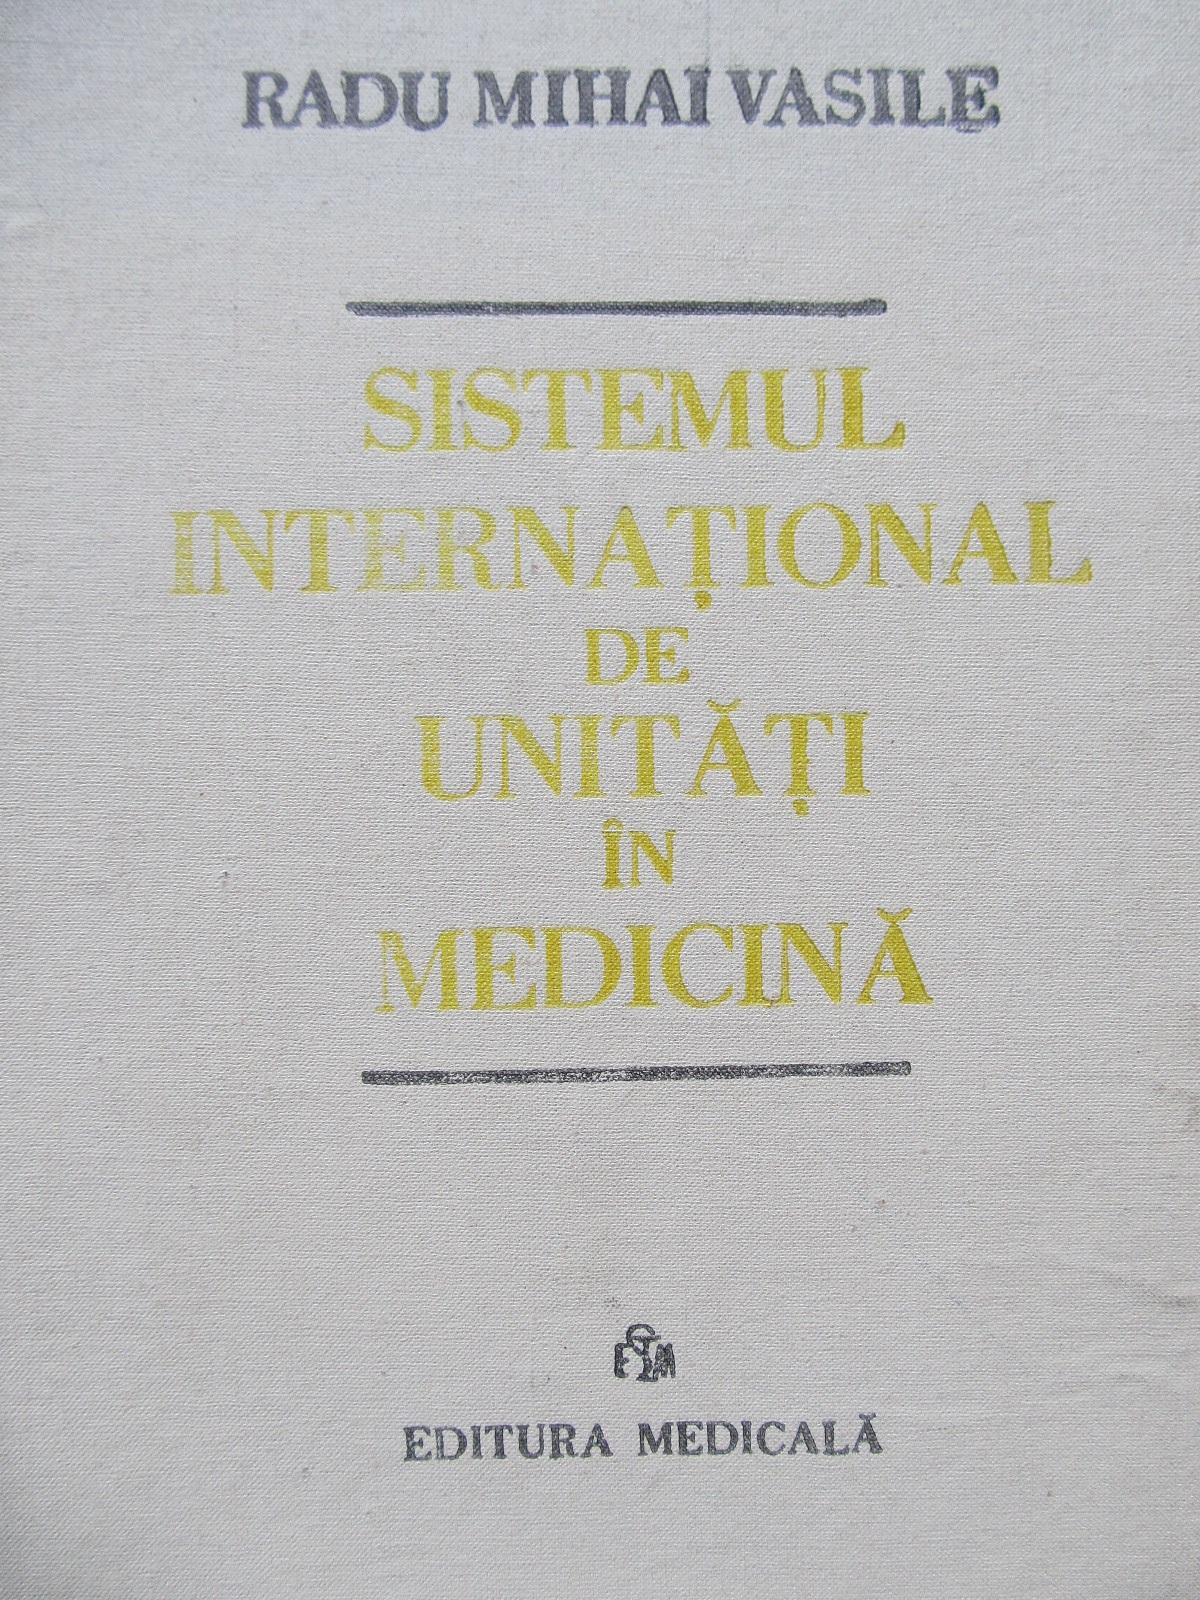 Sistemul international de unitati in medicina - Radu Mihai Vasile | Detalii carte